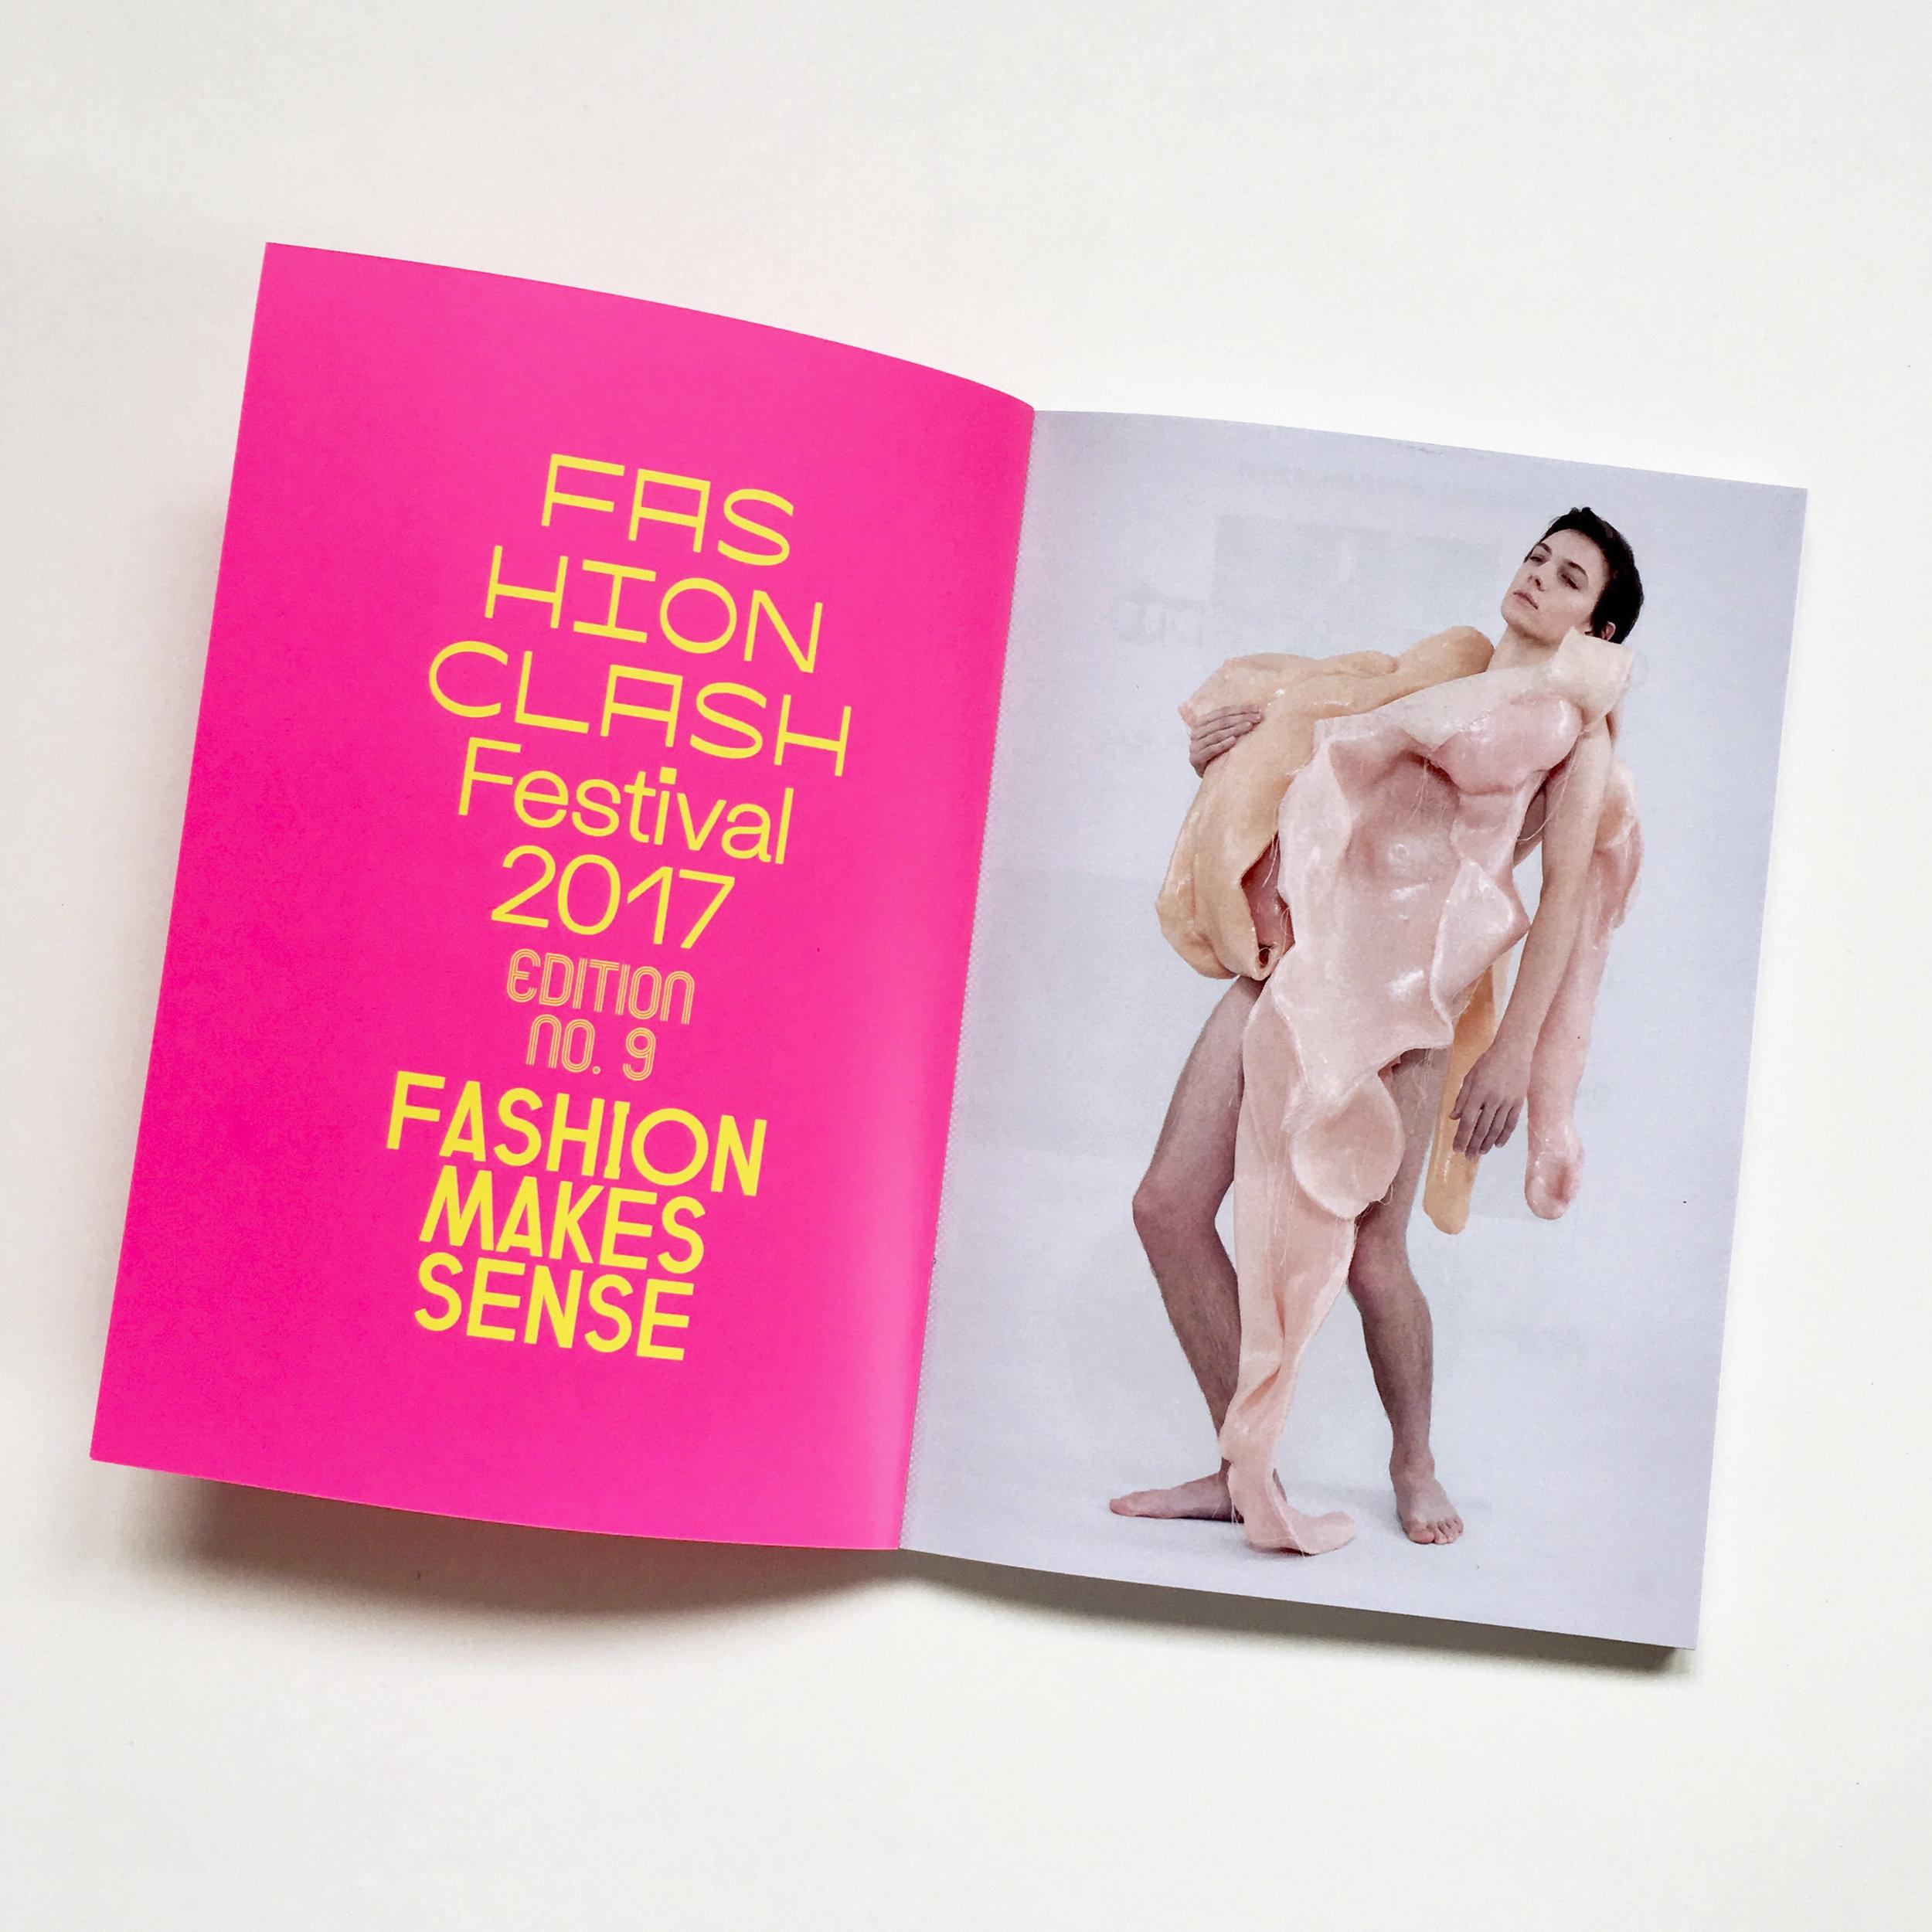 FASHIONmakesSENSE_Fashionclash_Magazine_001.jpg